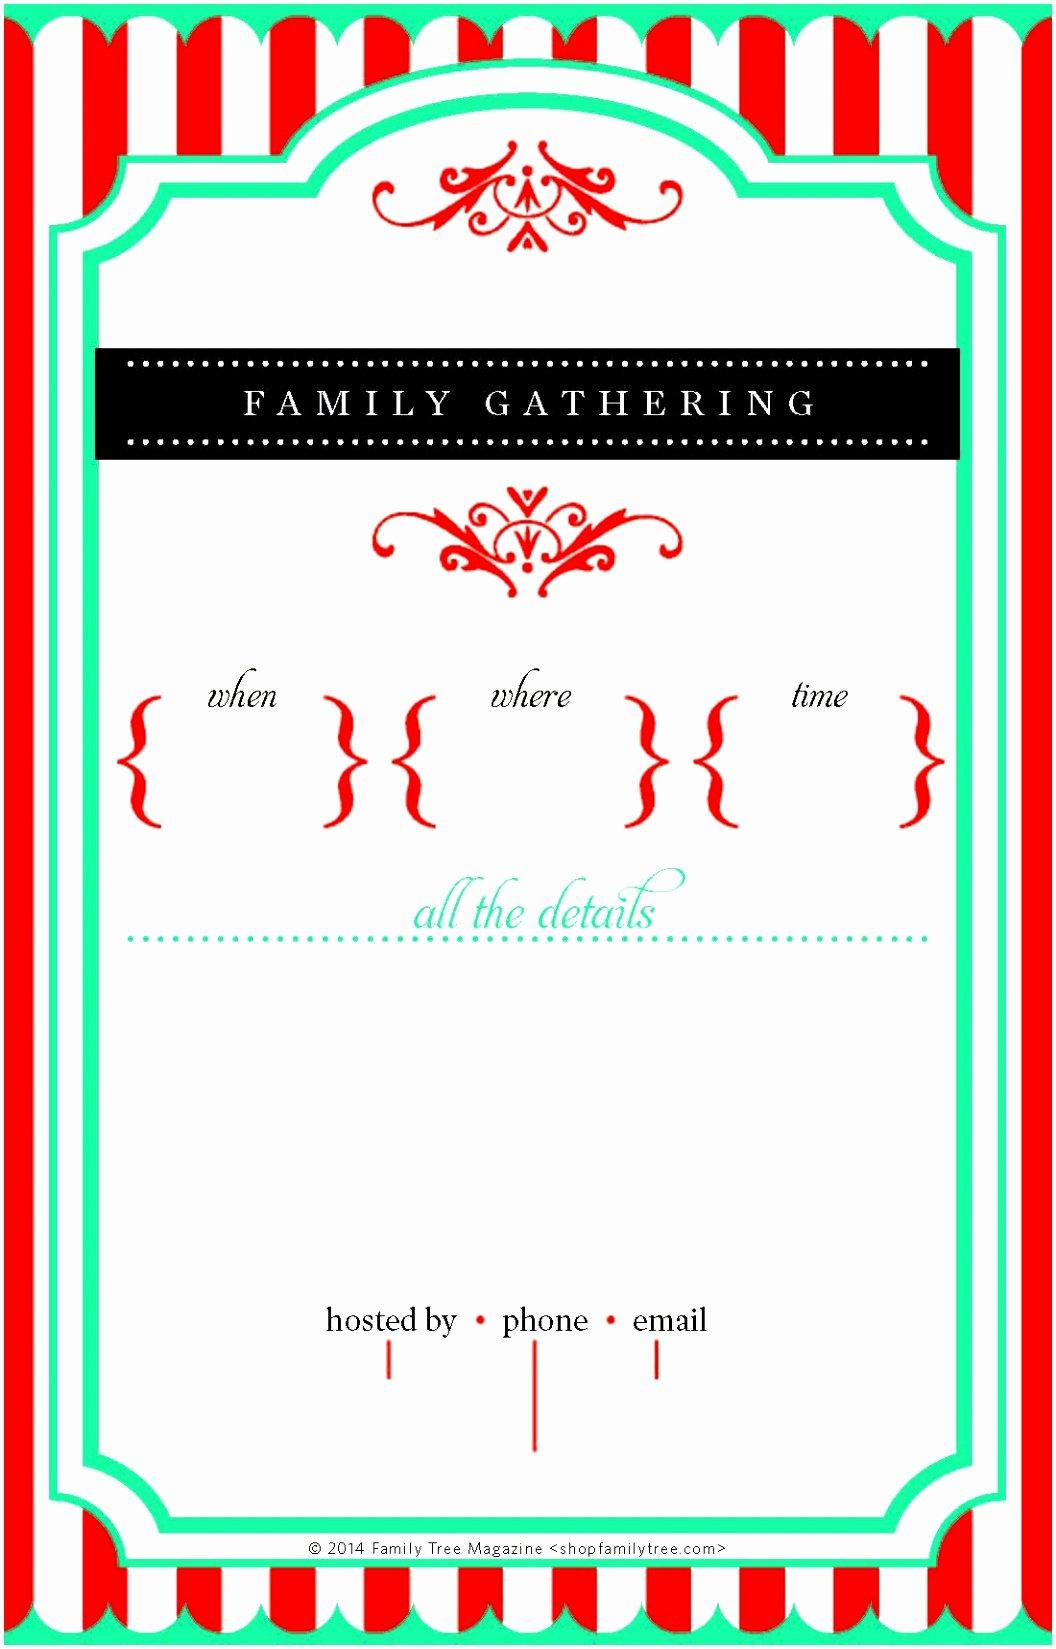 Free Printable Family Reunion Invitations Fiveoutsiders